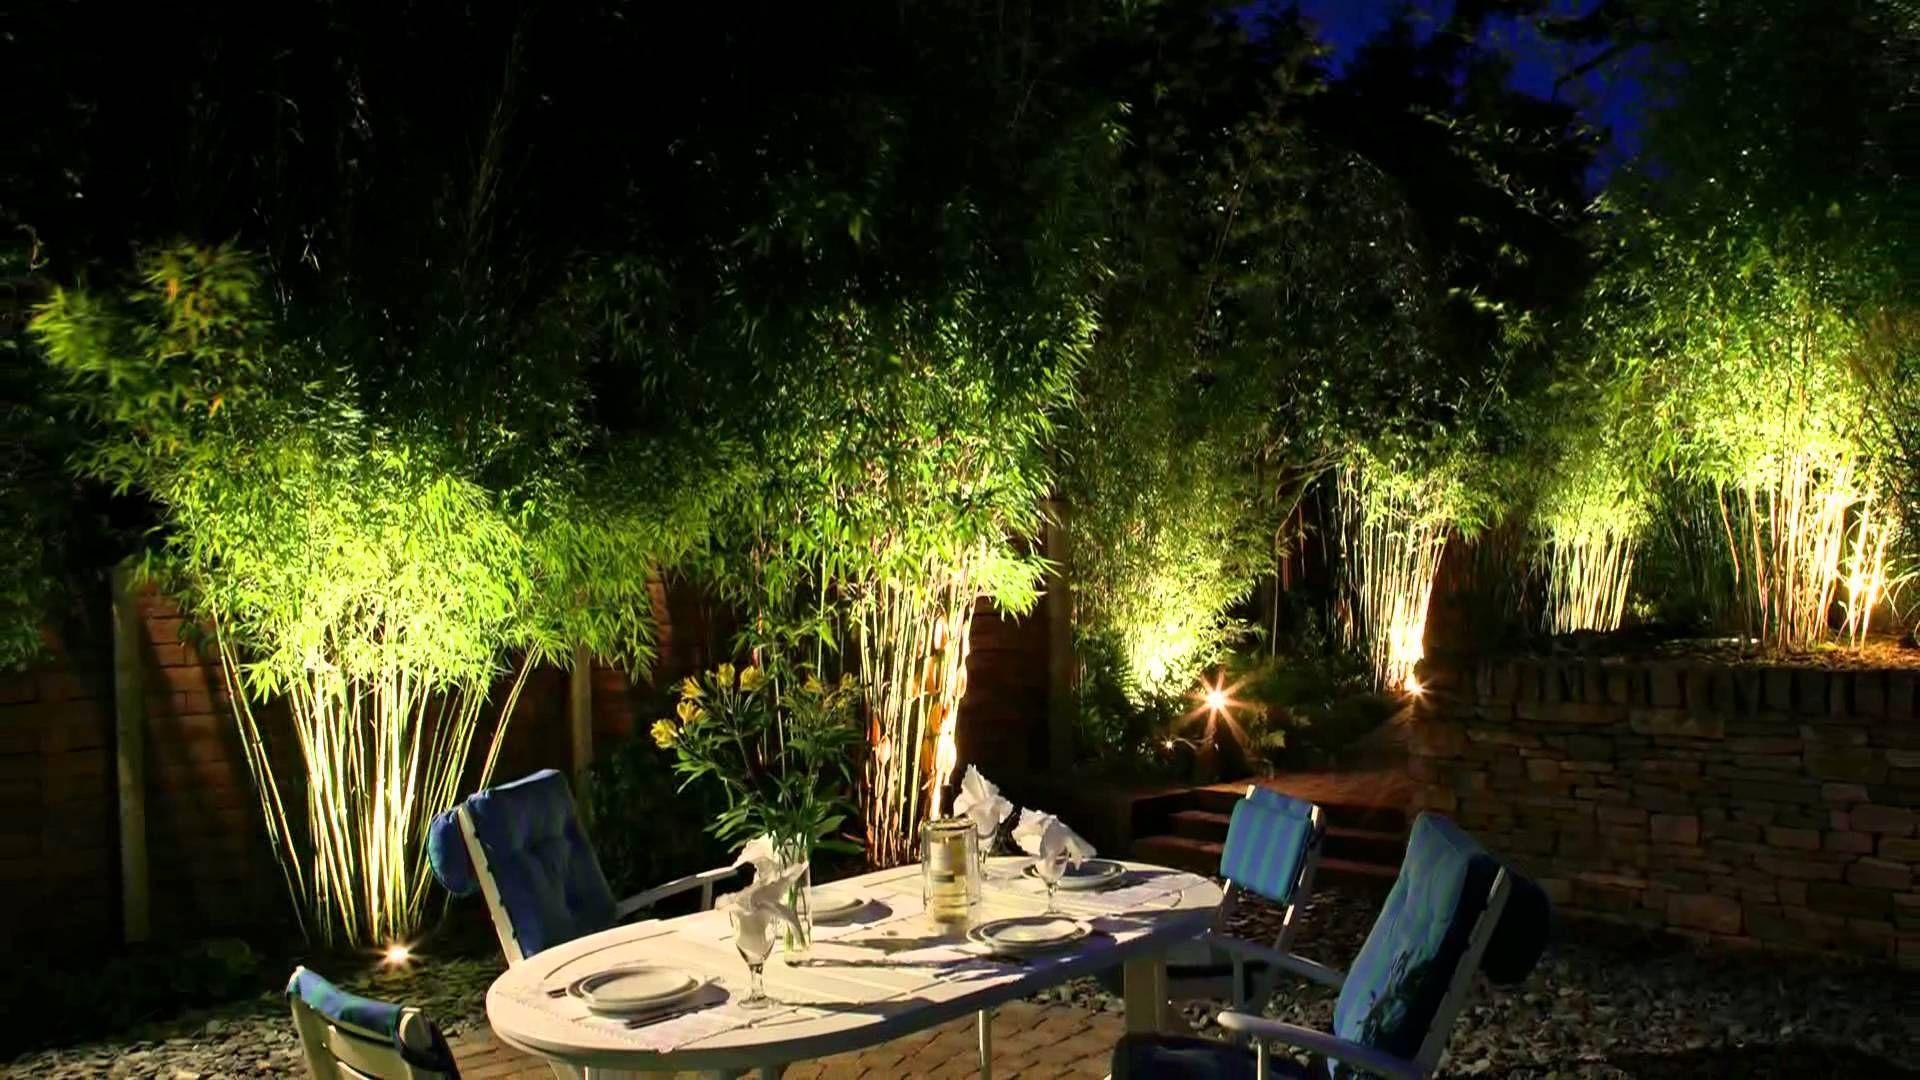 Garden Lights Ideas Garden Lights Moonlight Design Garden Lighting Speciali Nel 2020 Illuminazione Giardino Esterno Giardini Da Balcone Piccoli Giardini Contemporanei